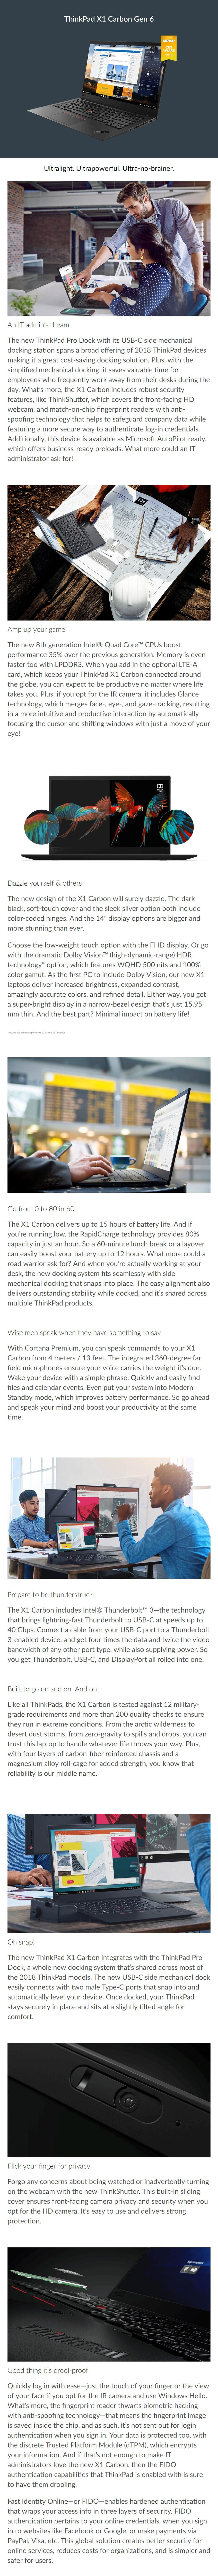 Lenovo ThinkPad X1 Carbon Gen 6 14